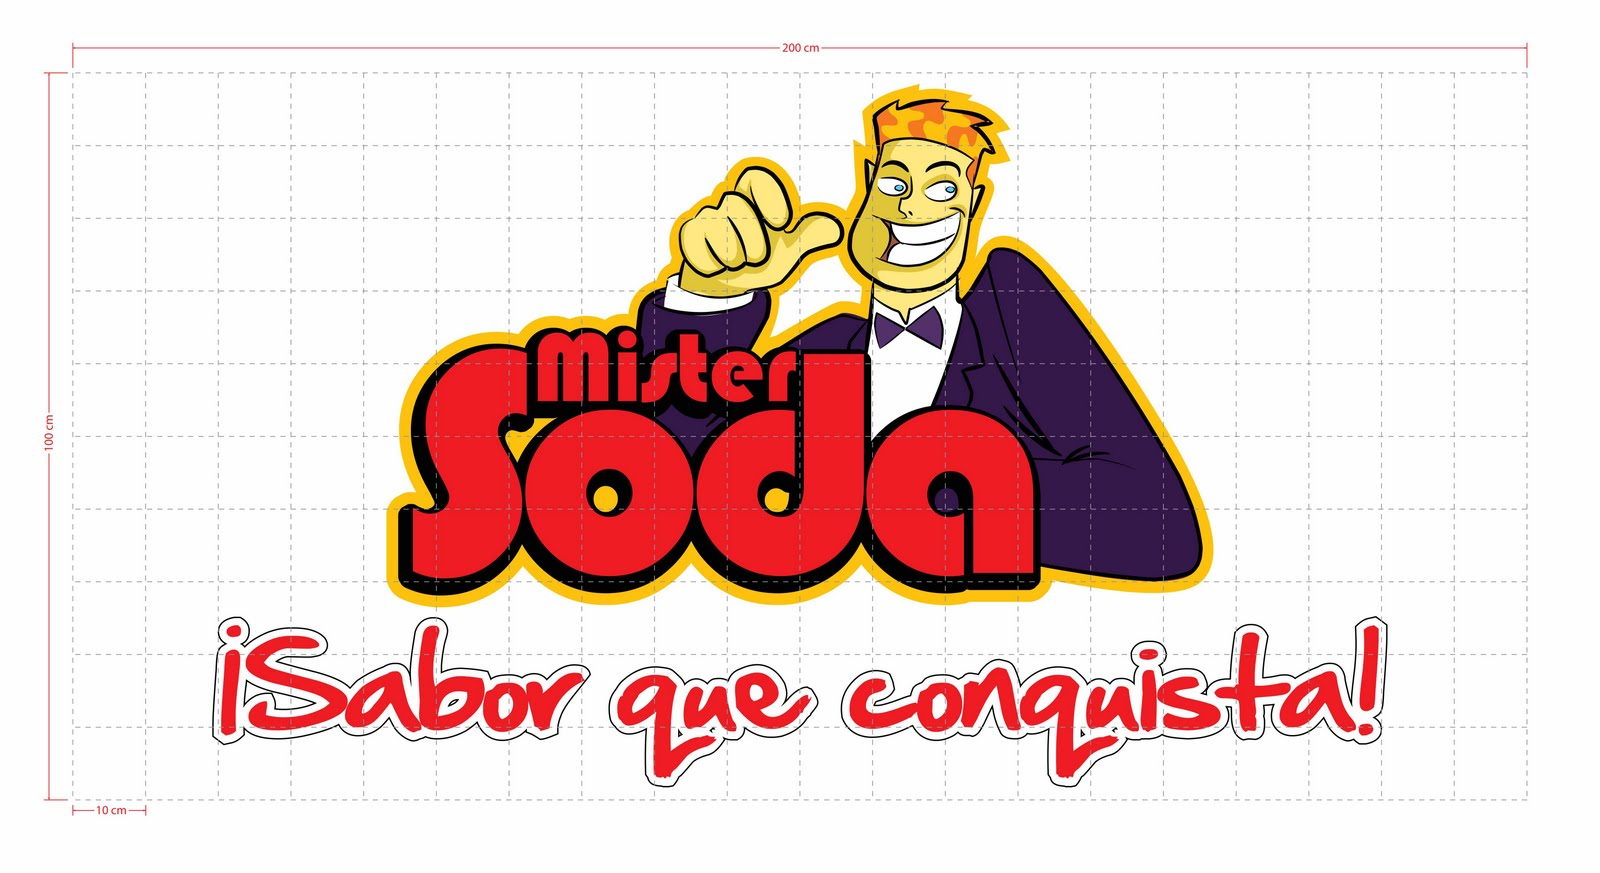 Muros Cola